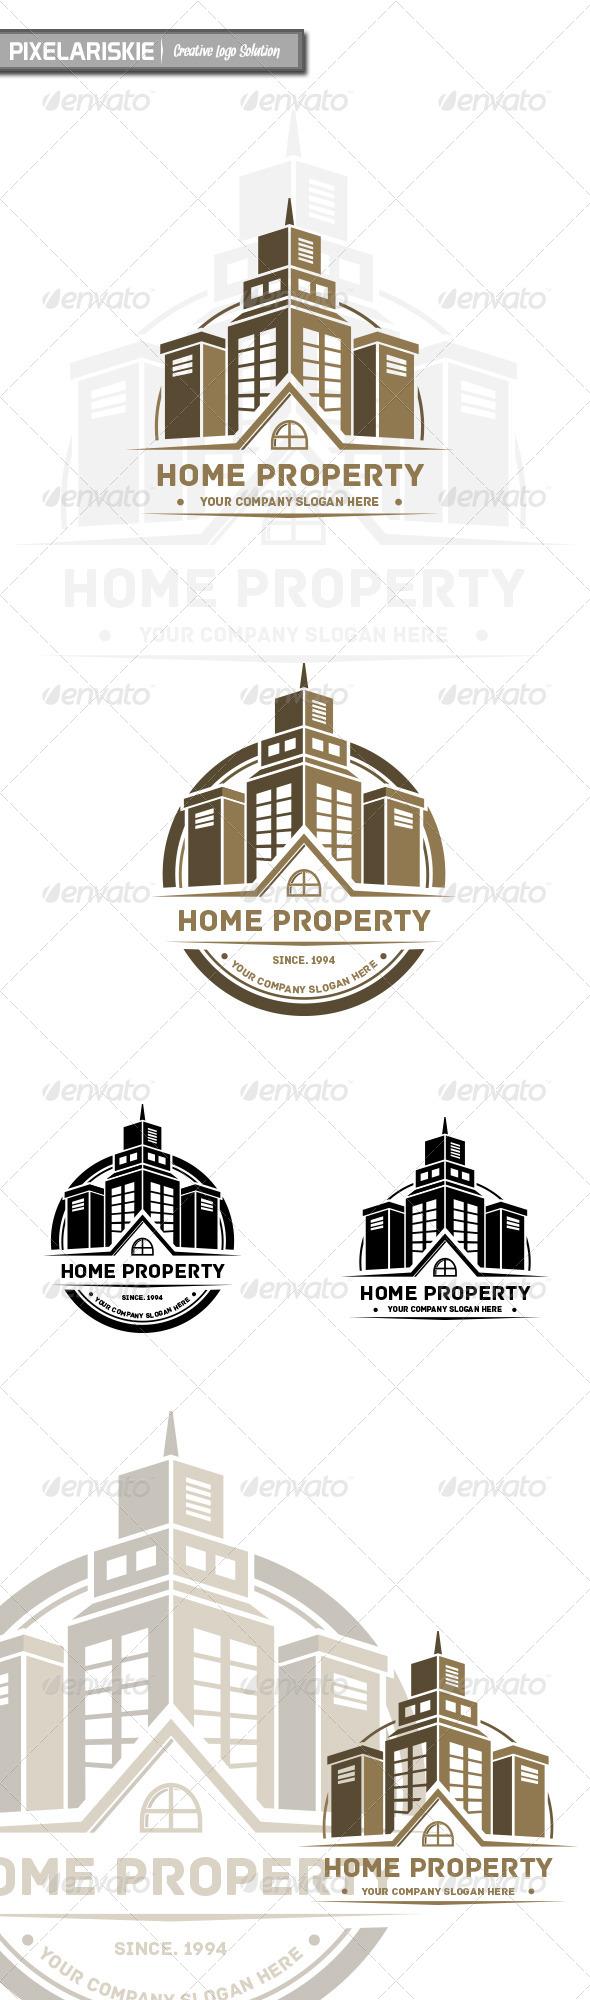 GraphicRiver Home Property Vintage Arch Logo 6605105